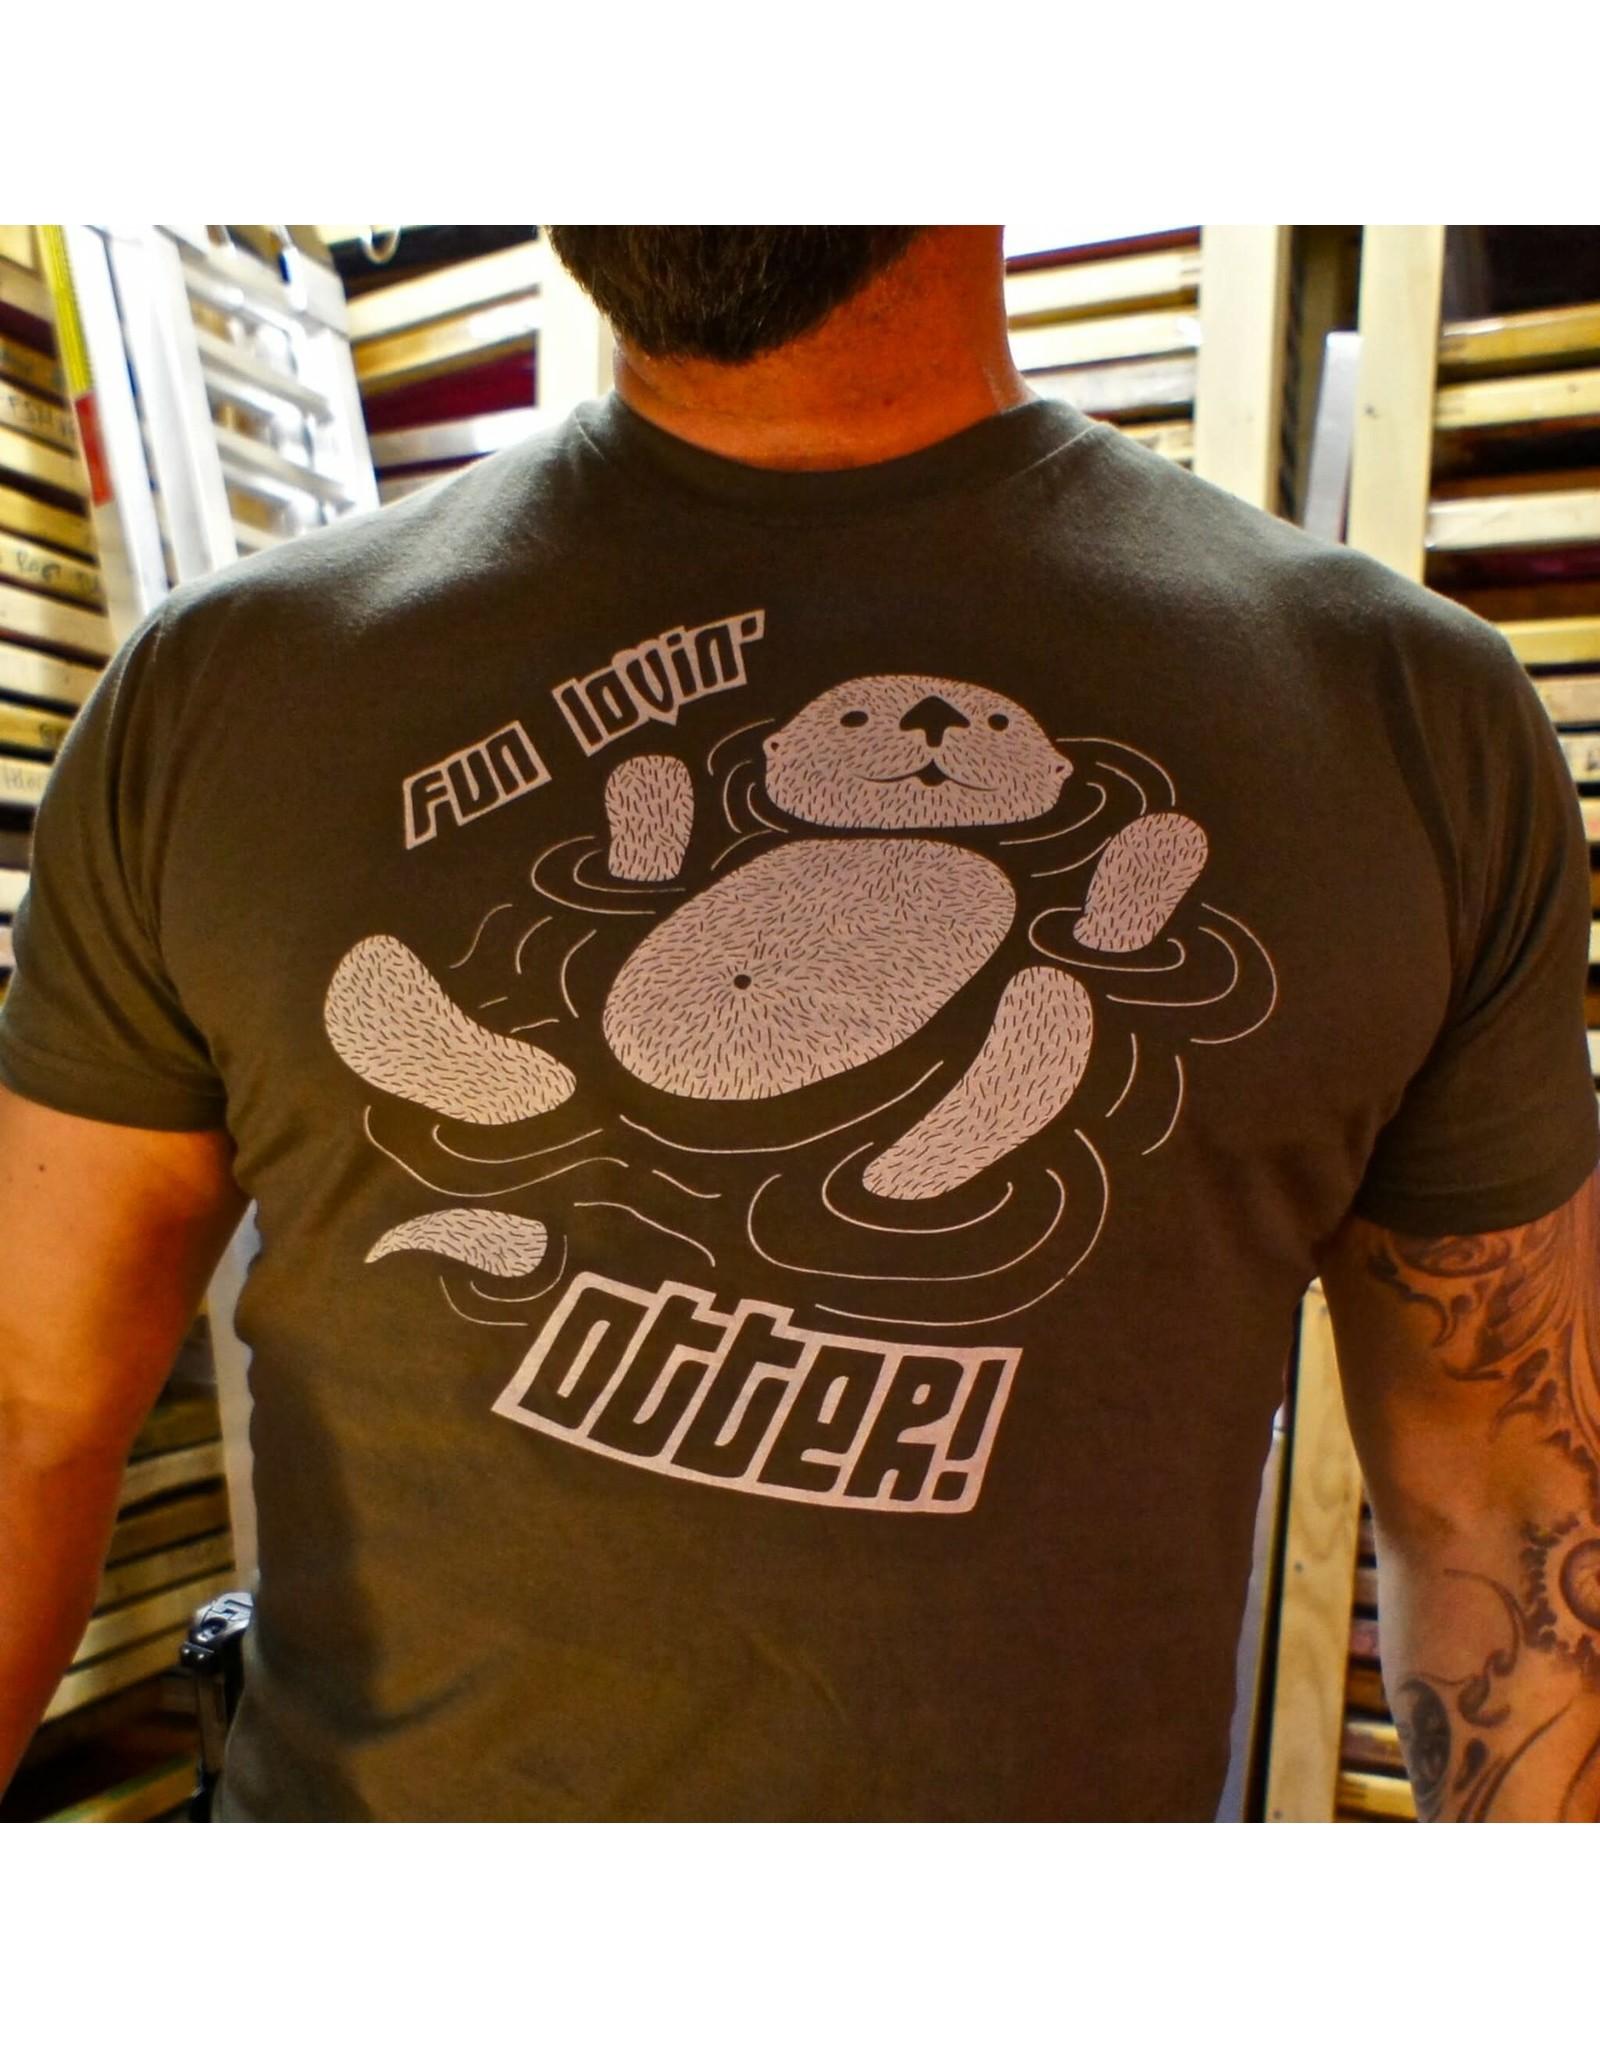 Shane Ruff Studio Burly Shirts Fun Lovin' Otter